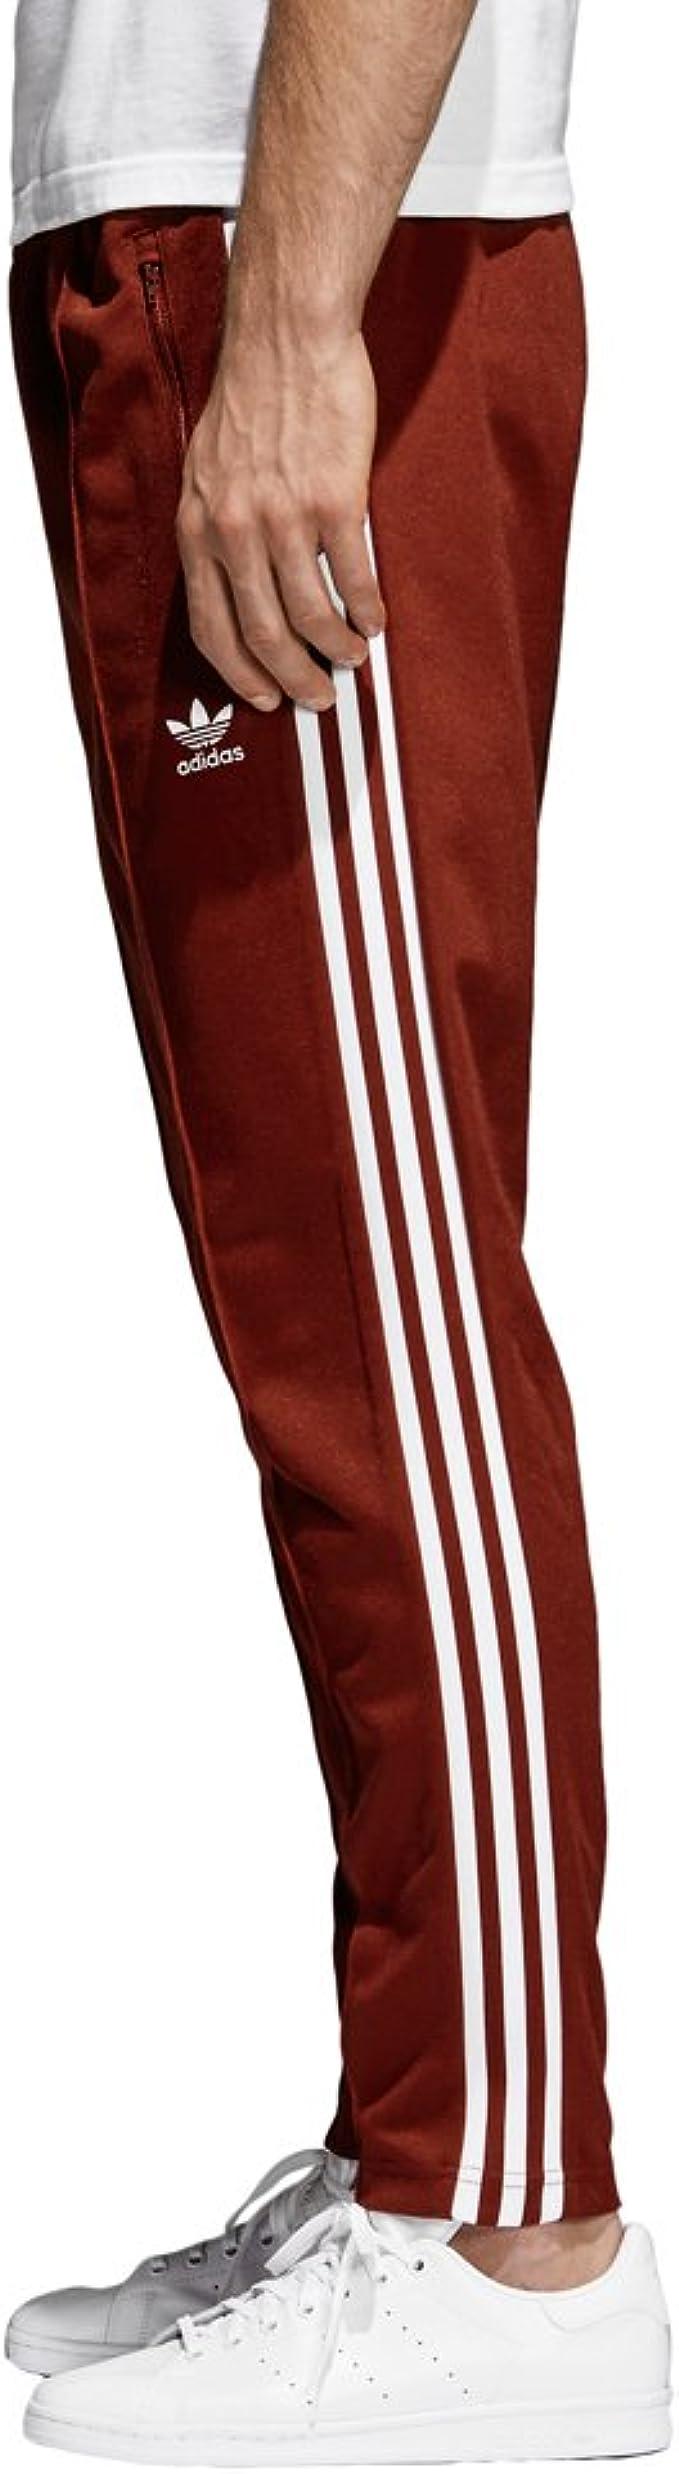 adidas Beckenbauer TP, Pantaloni Sportivi Uomo